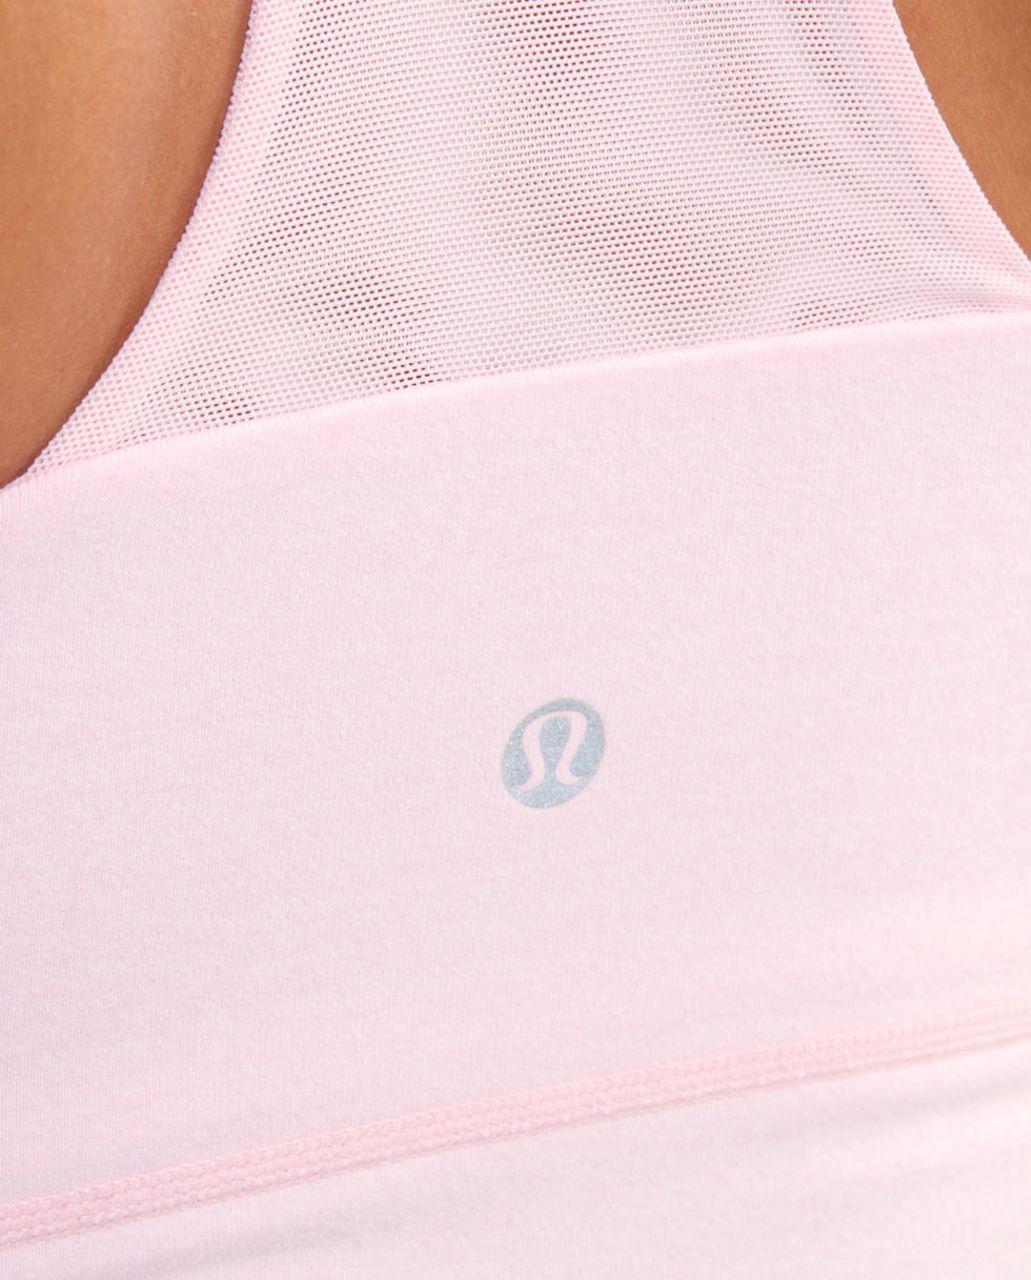 Lululemon Scoop Neck Tank - Heathered Pig Pink /  Pig Pink